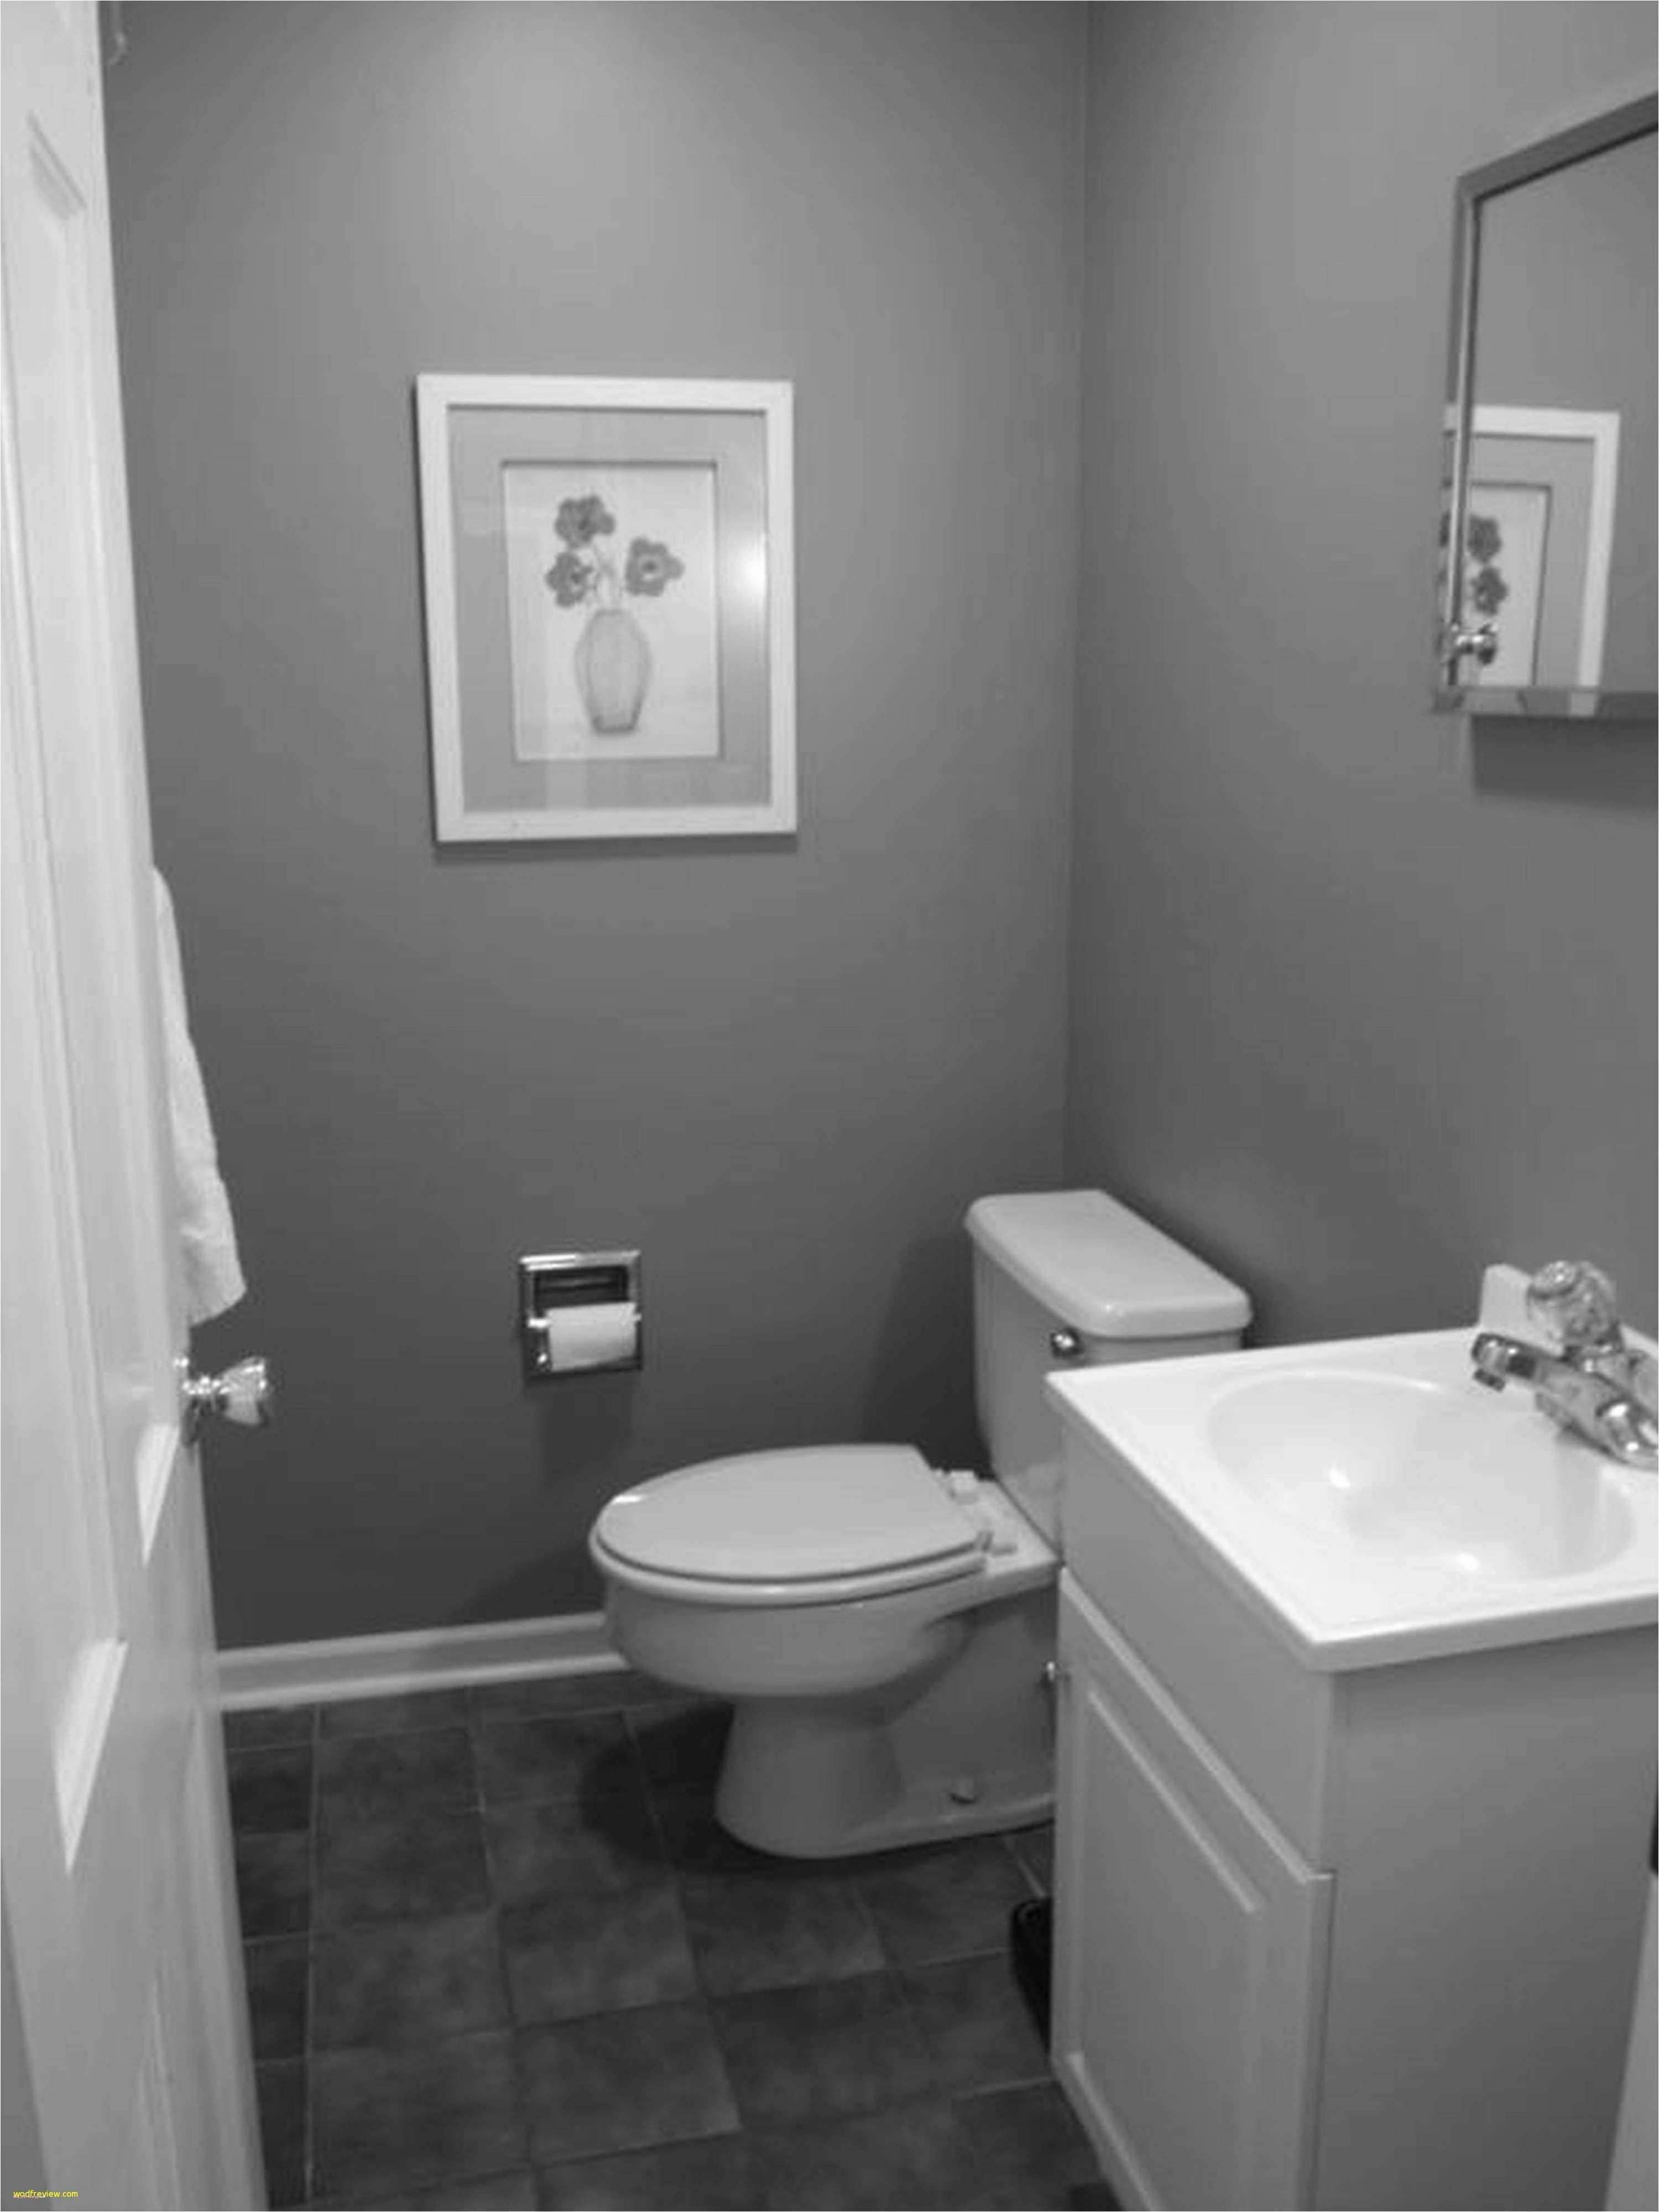 Small Contemporary Bathroom Design Ideas Contemporary Bedroom Ideas for Small Rooms Awesome Small Bathroom